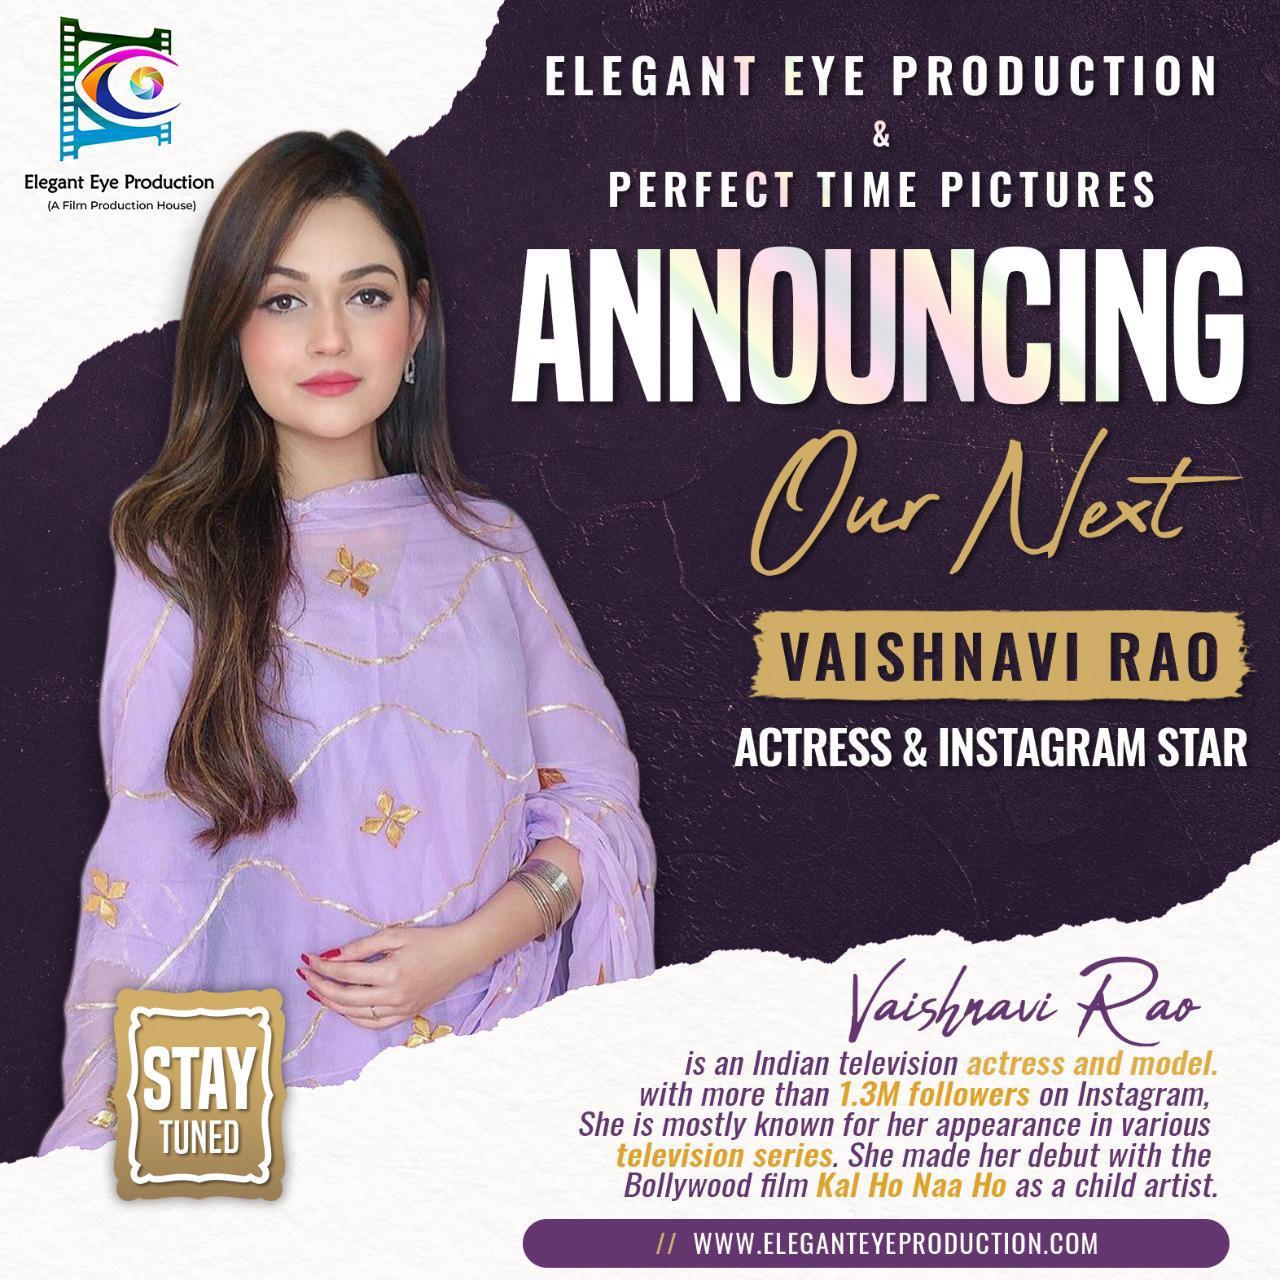 Announcing Our Next - Vaishnavi Rao